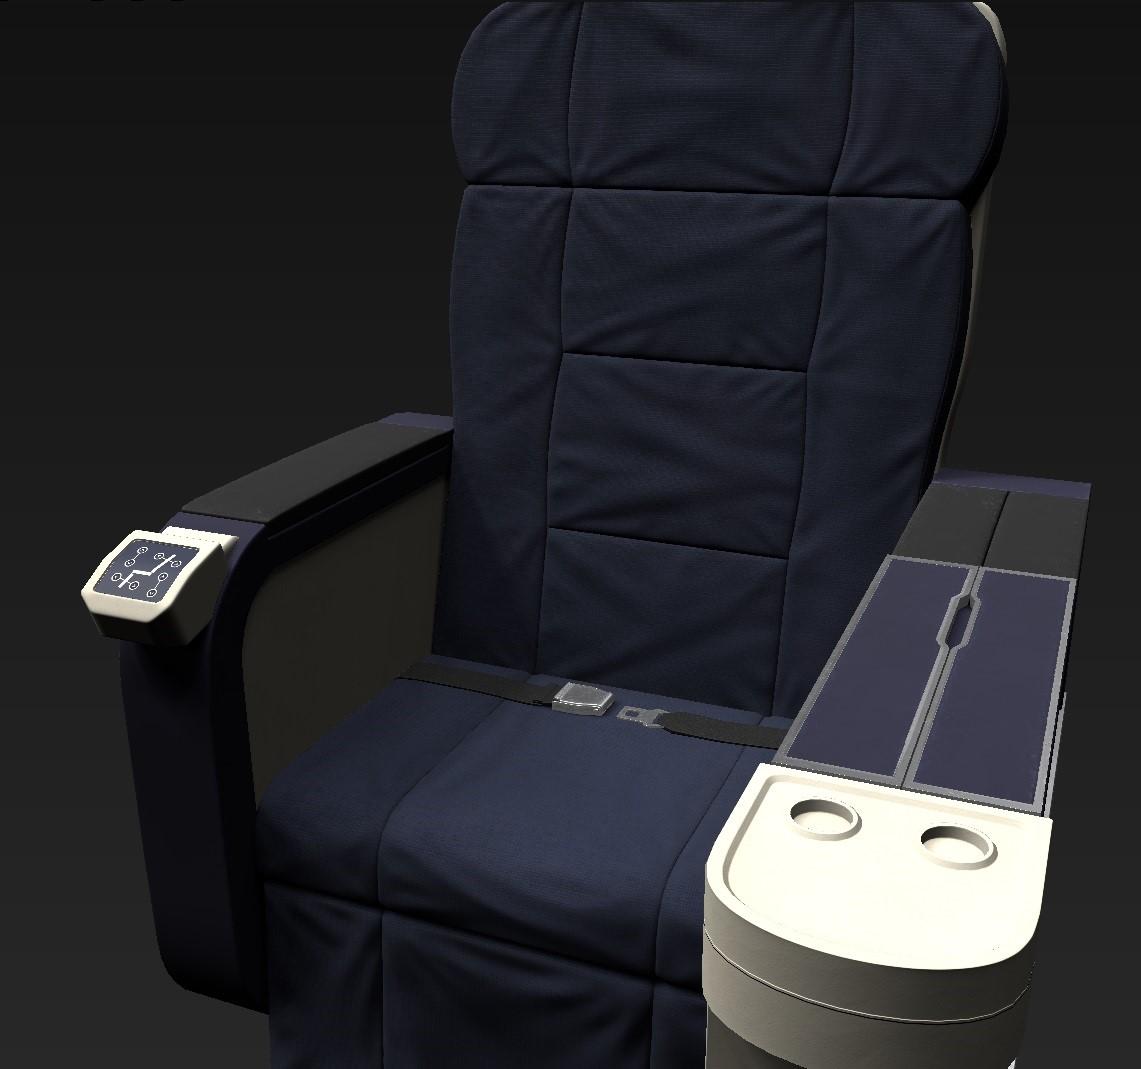 Airplane_Seat_19.jpg